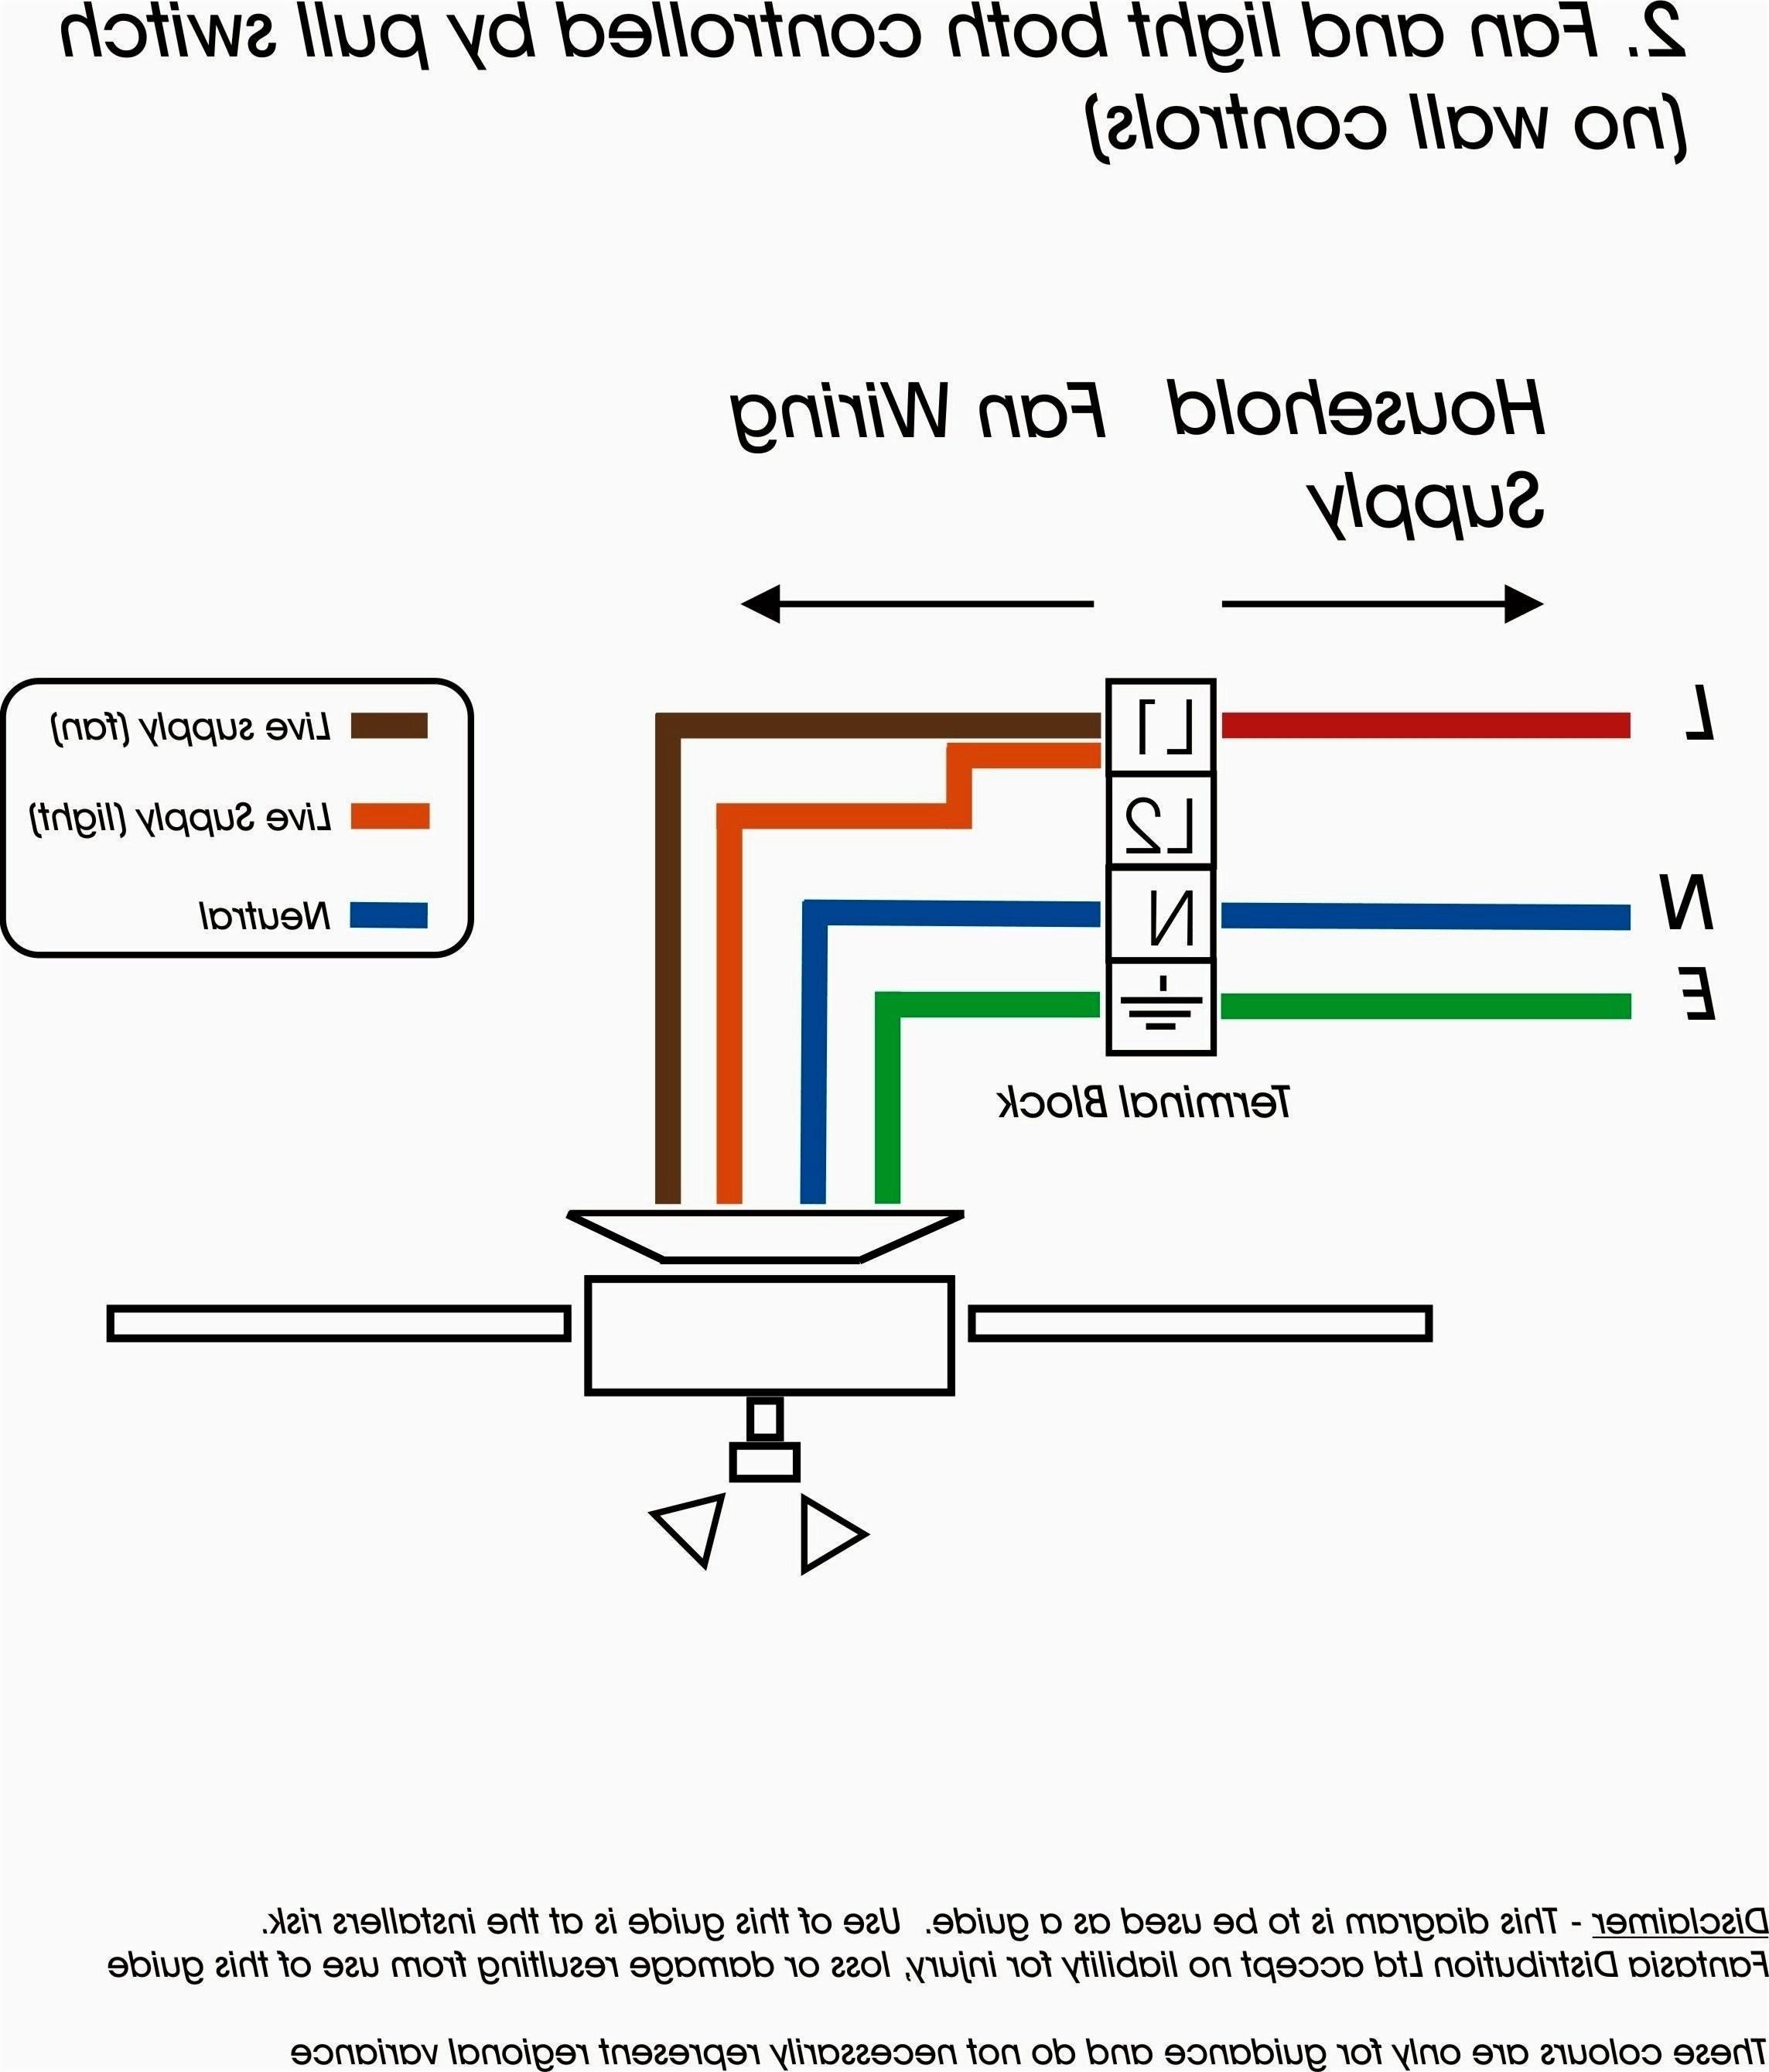 Orbit Pump Relay Wiring Diagram Ao 4797] Wiring Diagram for orbit Sprinkler Timer Free About Of Orbit Pump Relay Wiring Diagram